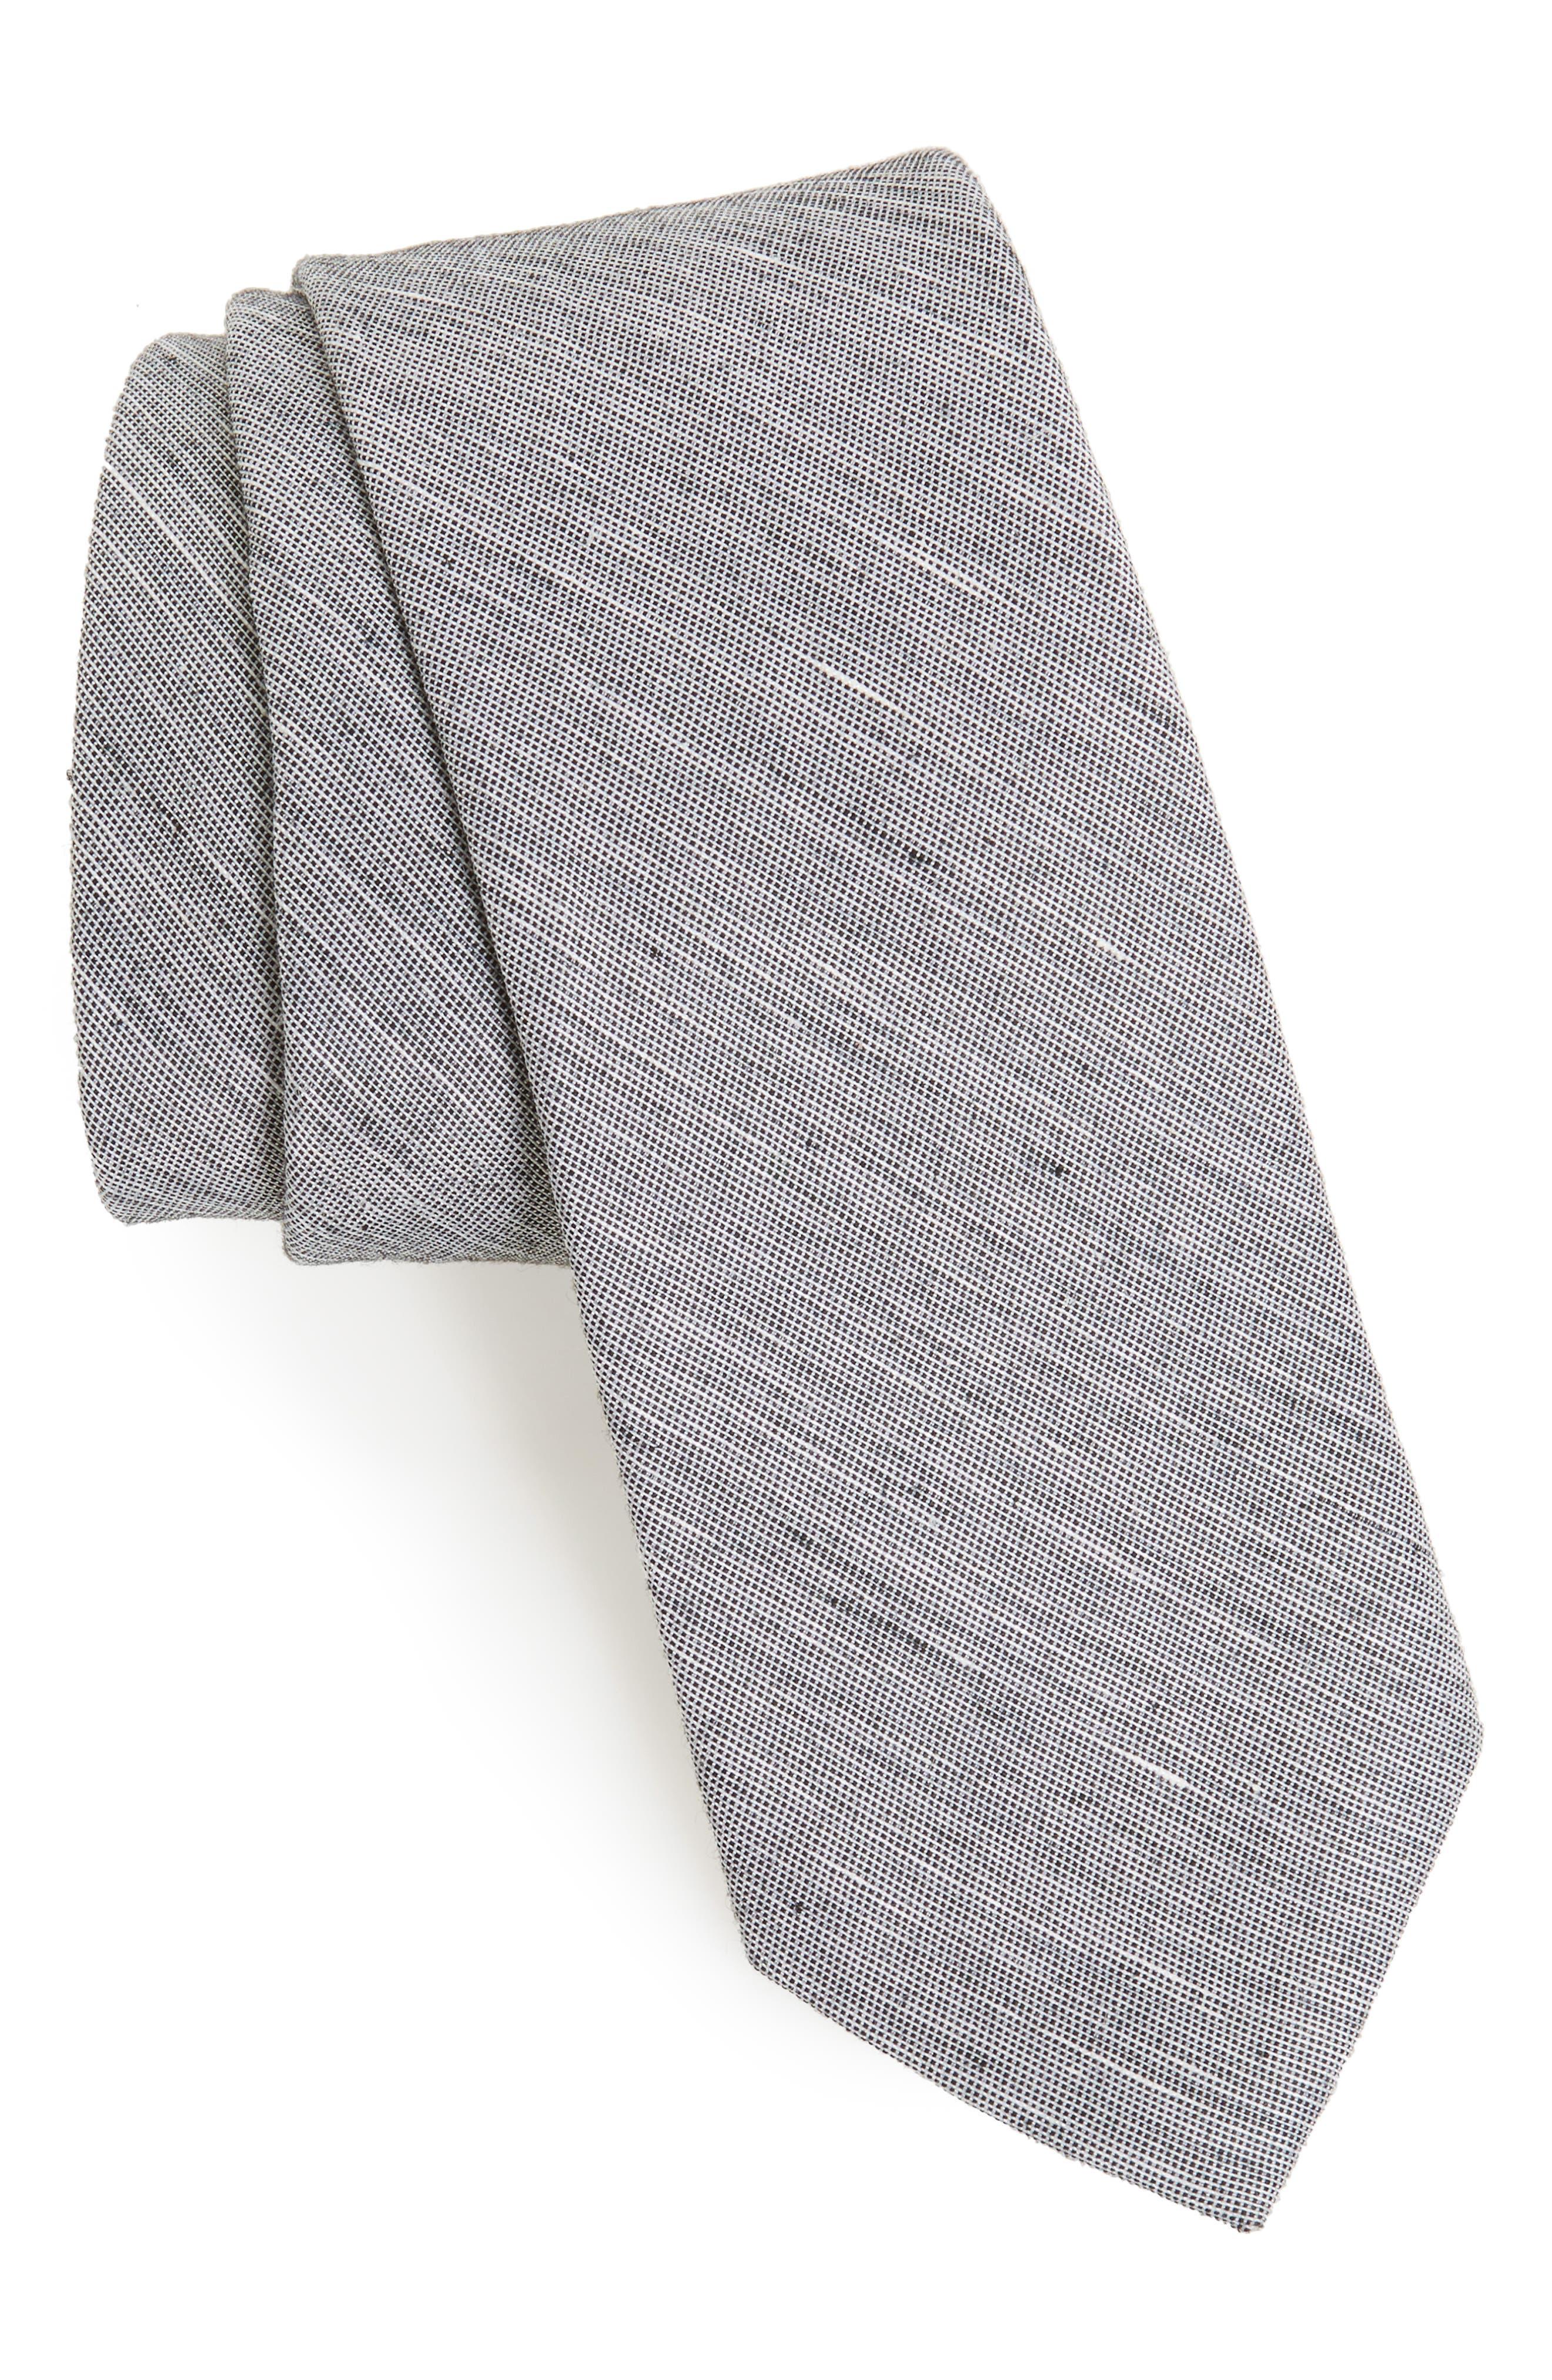 Adena Solid Silk Blend Skinny Tie,                             Main thumbnail 1, color,                             001